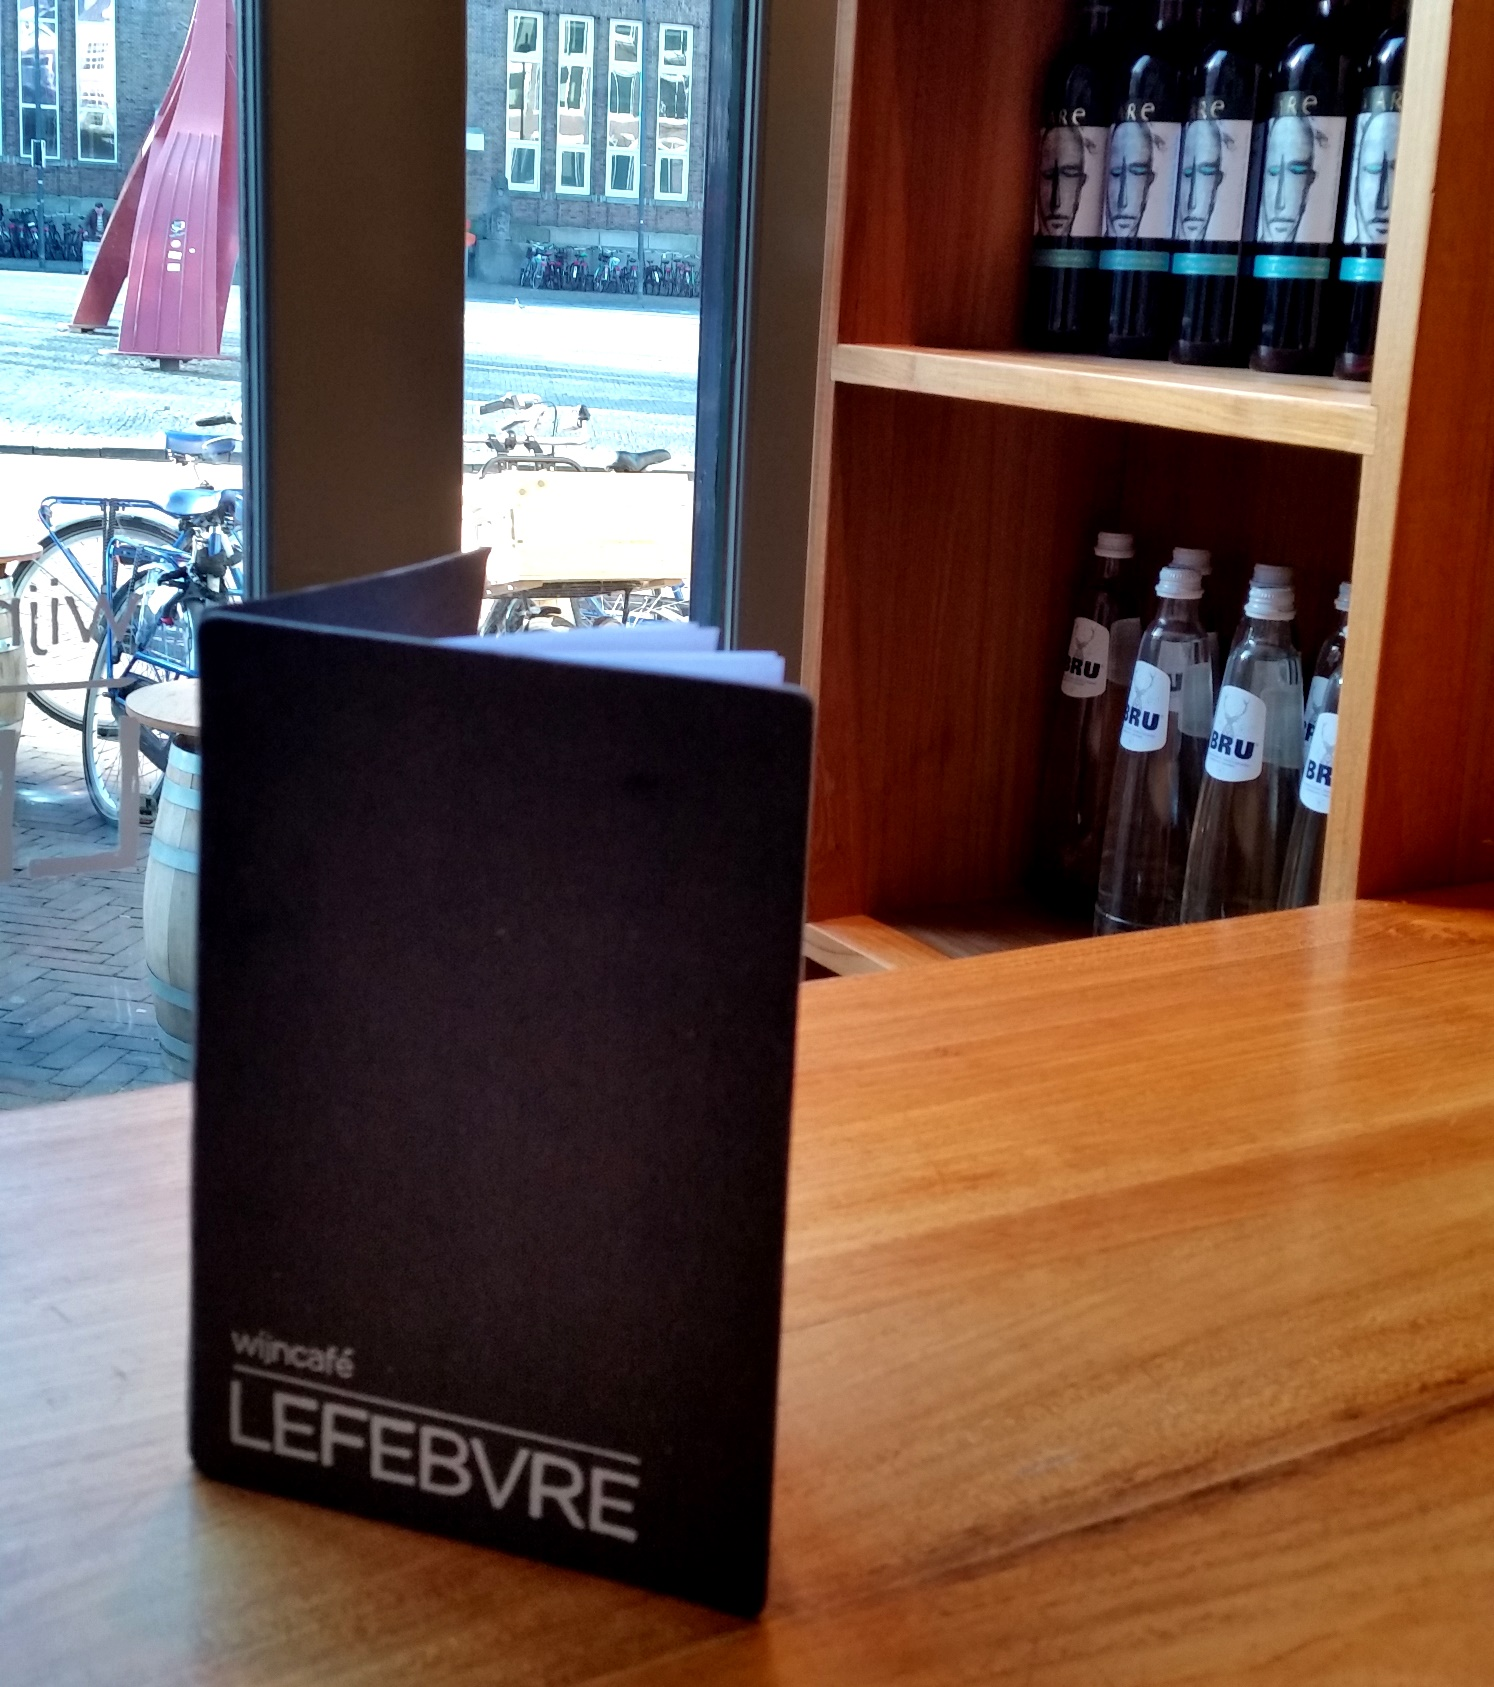 Wijncafé Lefebvre